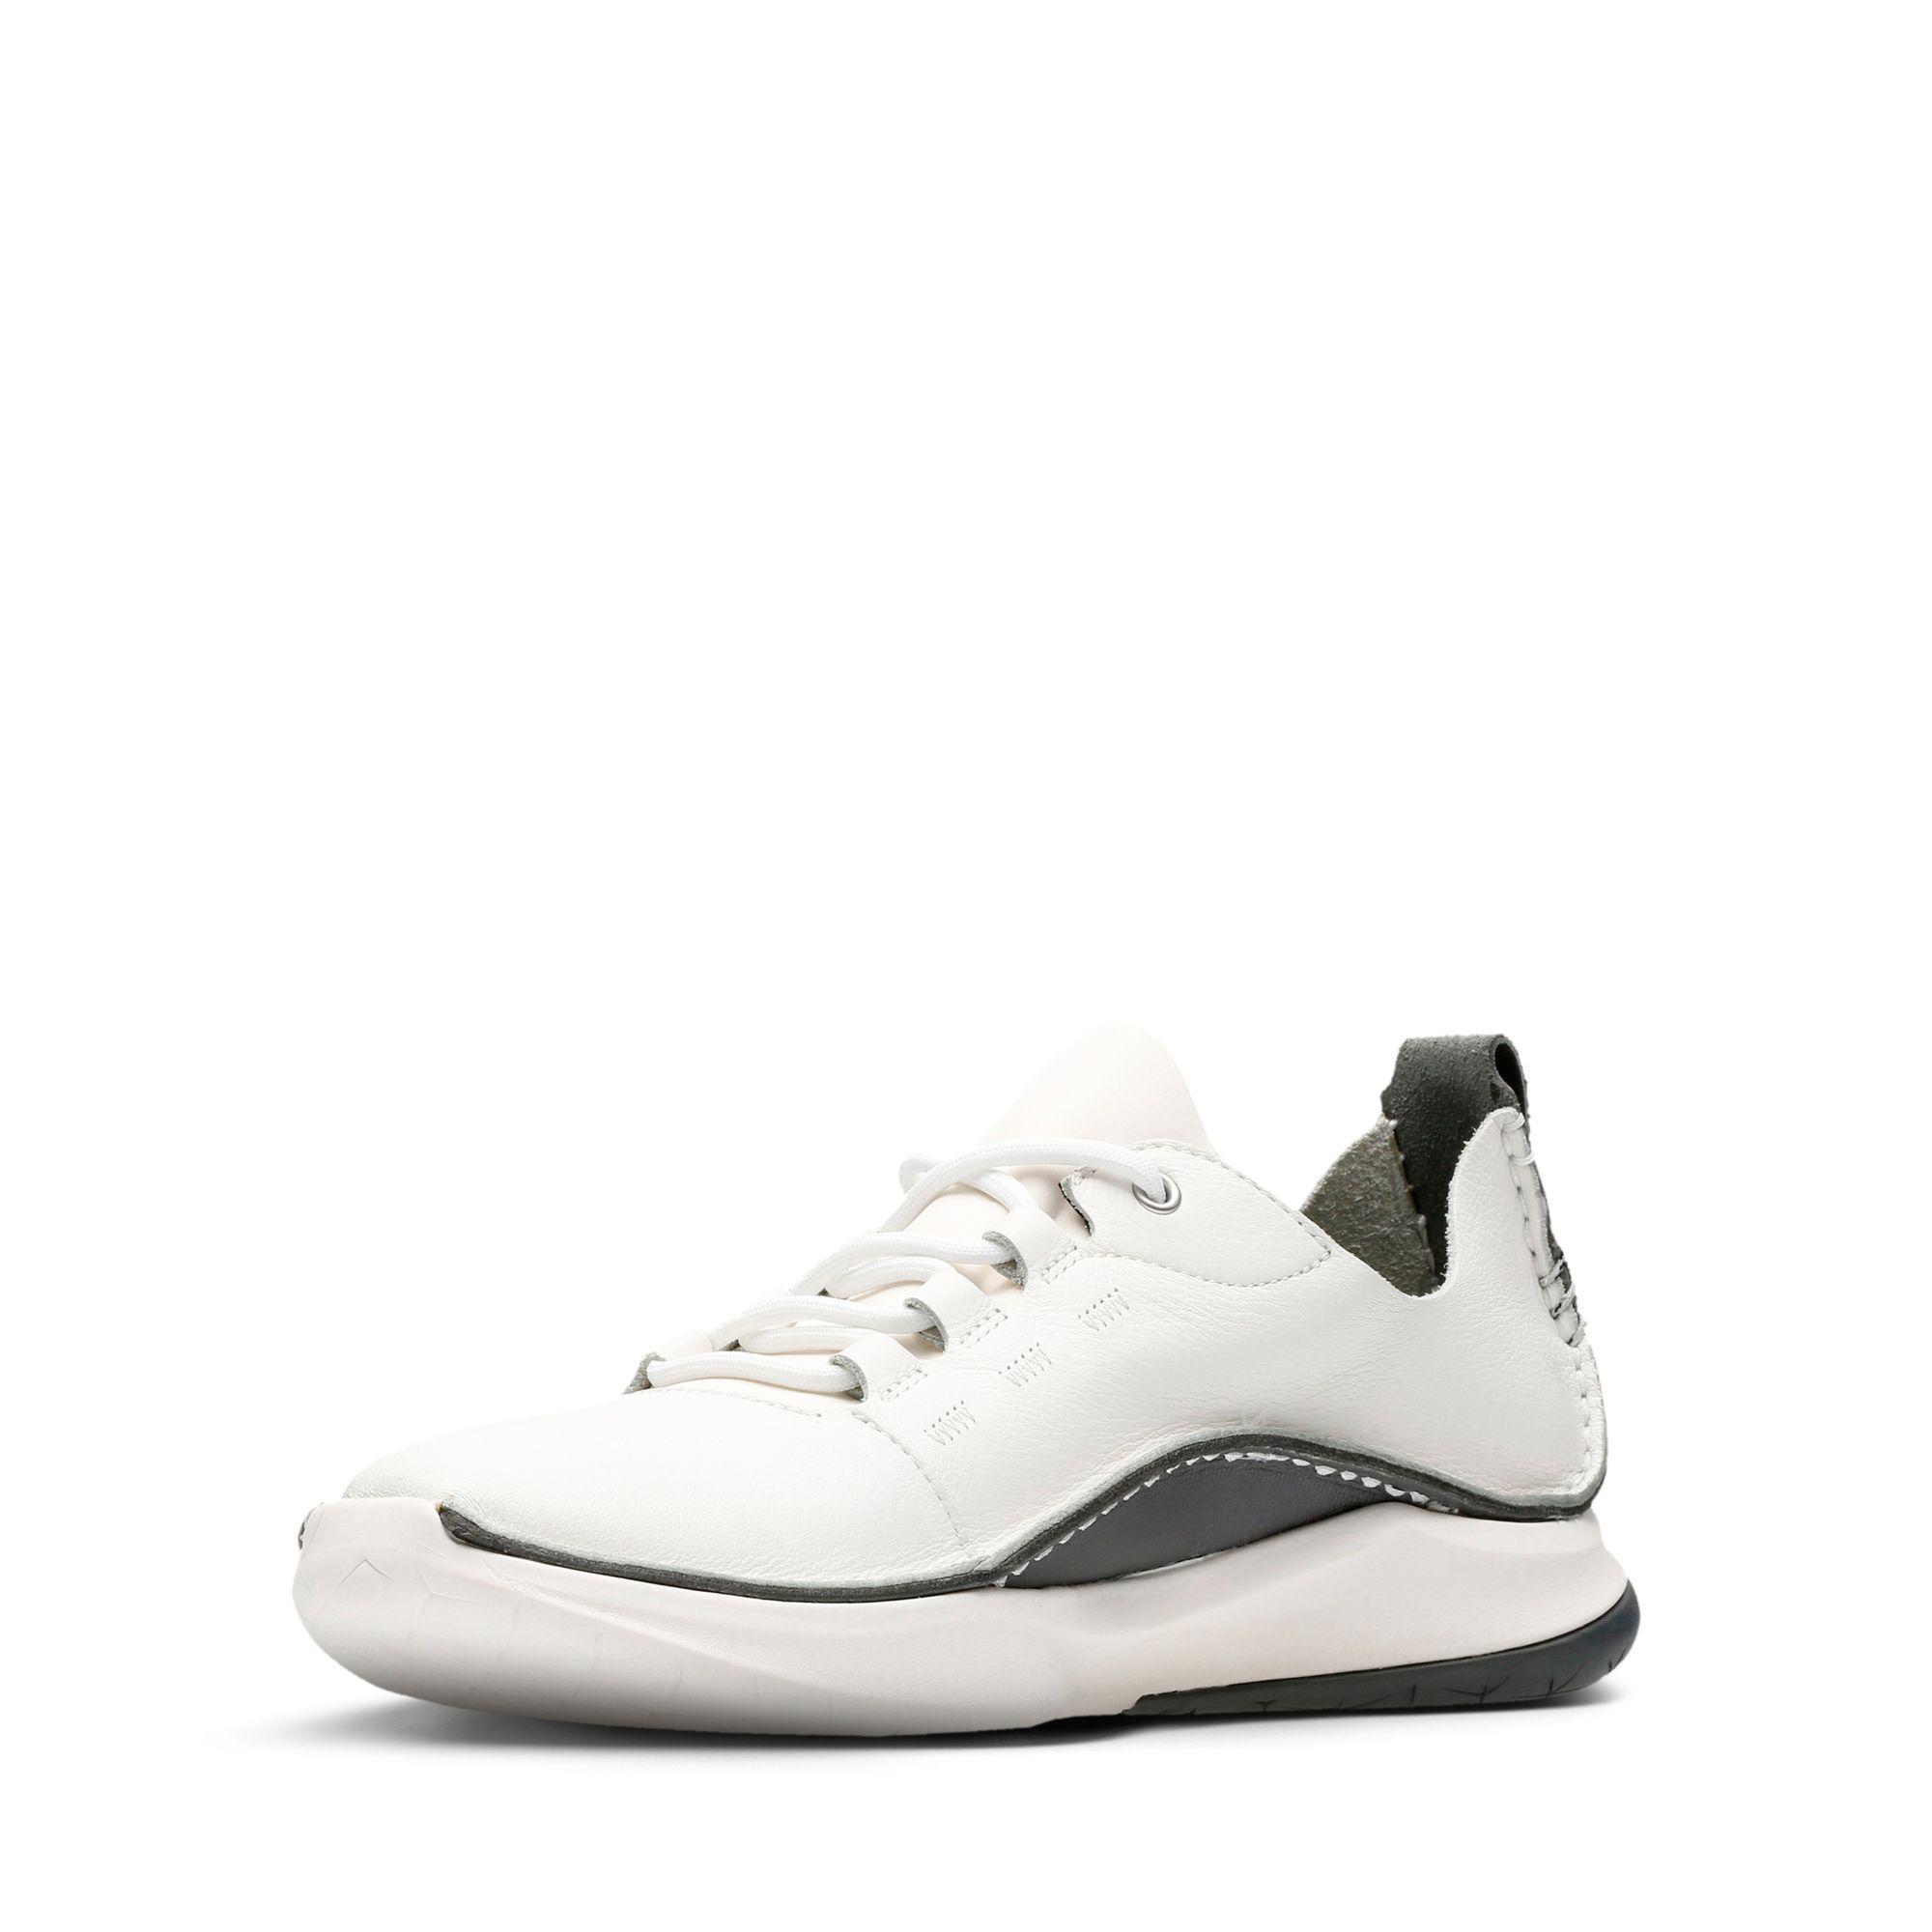 zapatos skechers 2018 new white rose original